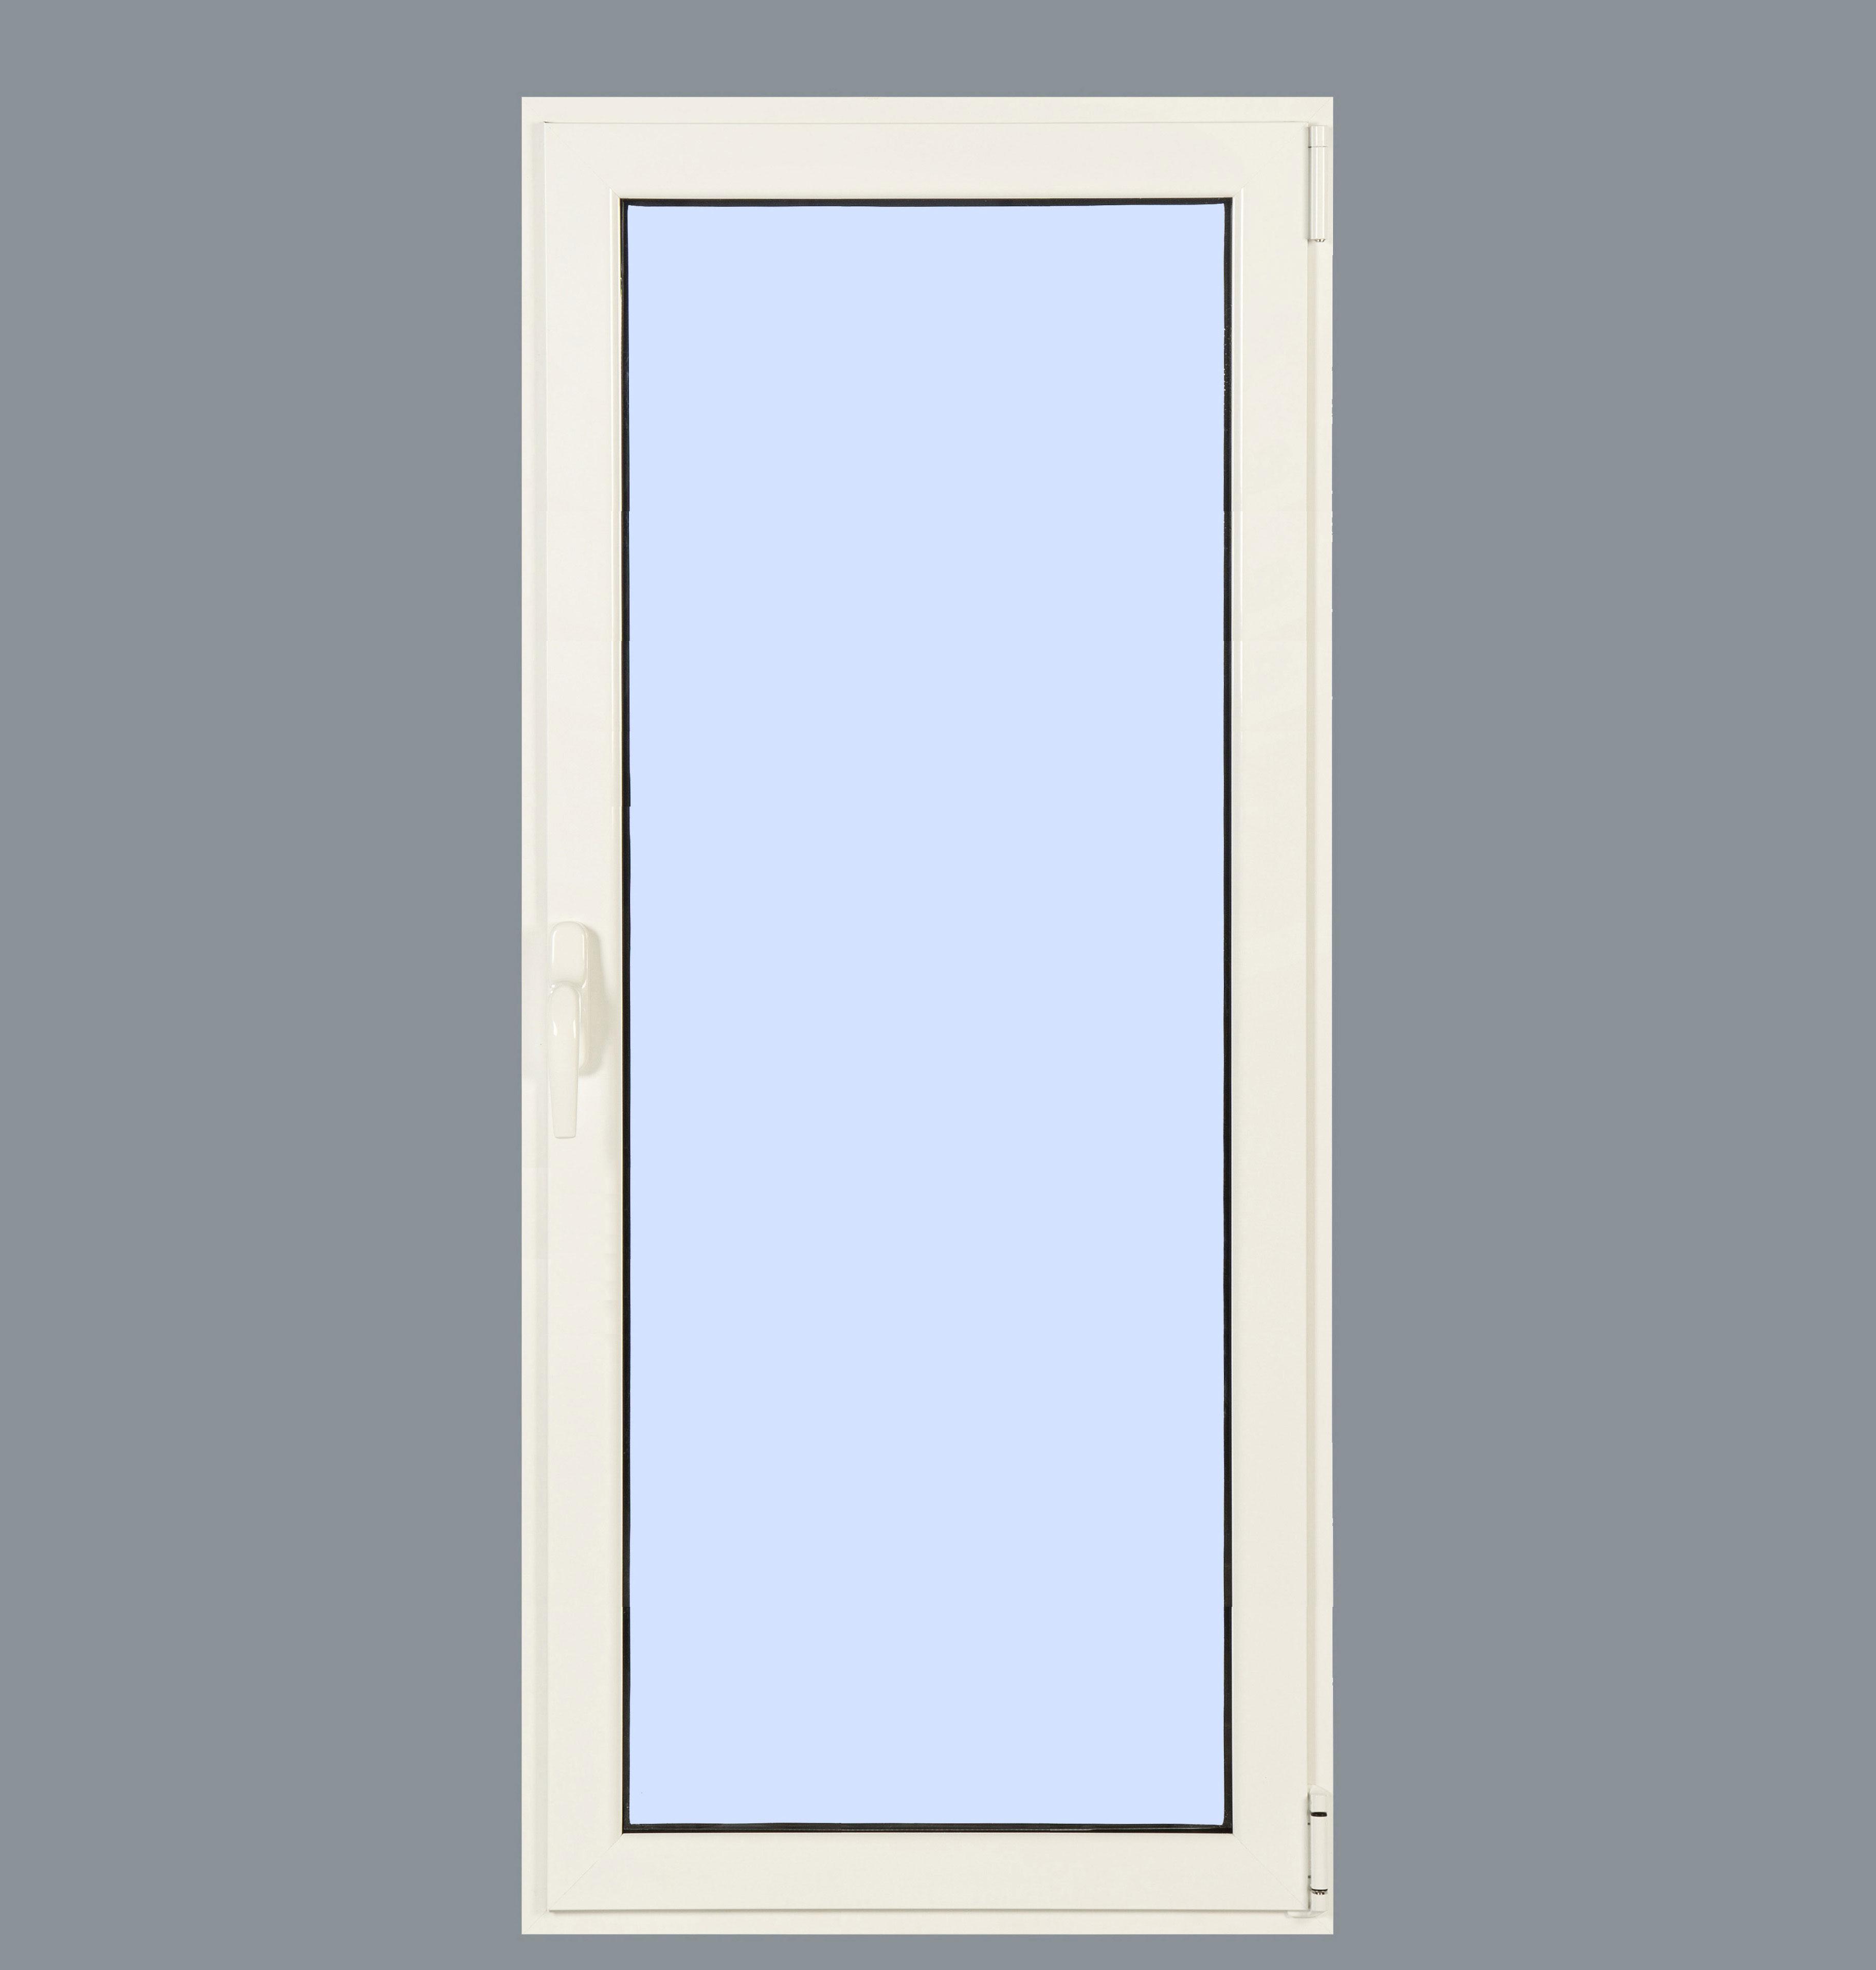 Puerta balconera aluminio practicable derecha 800x2000 1h - Puerta balconera aluminio ...